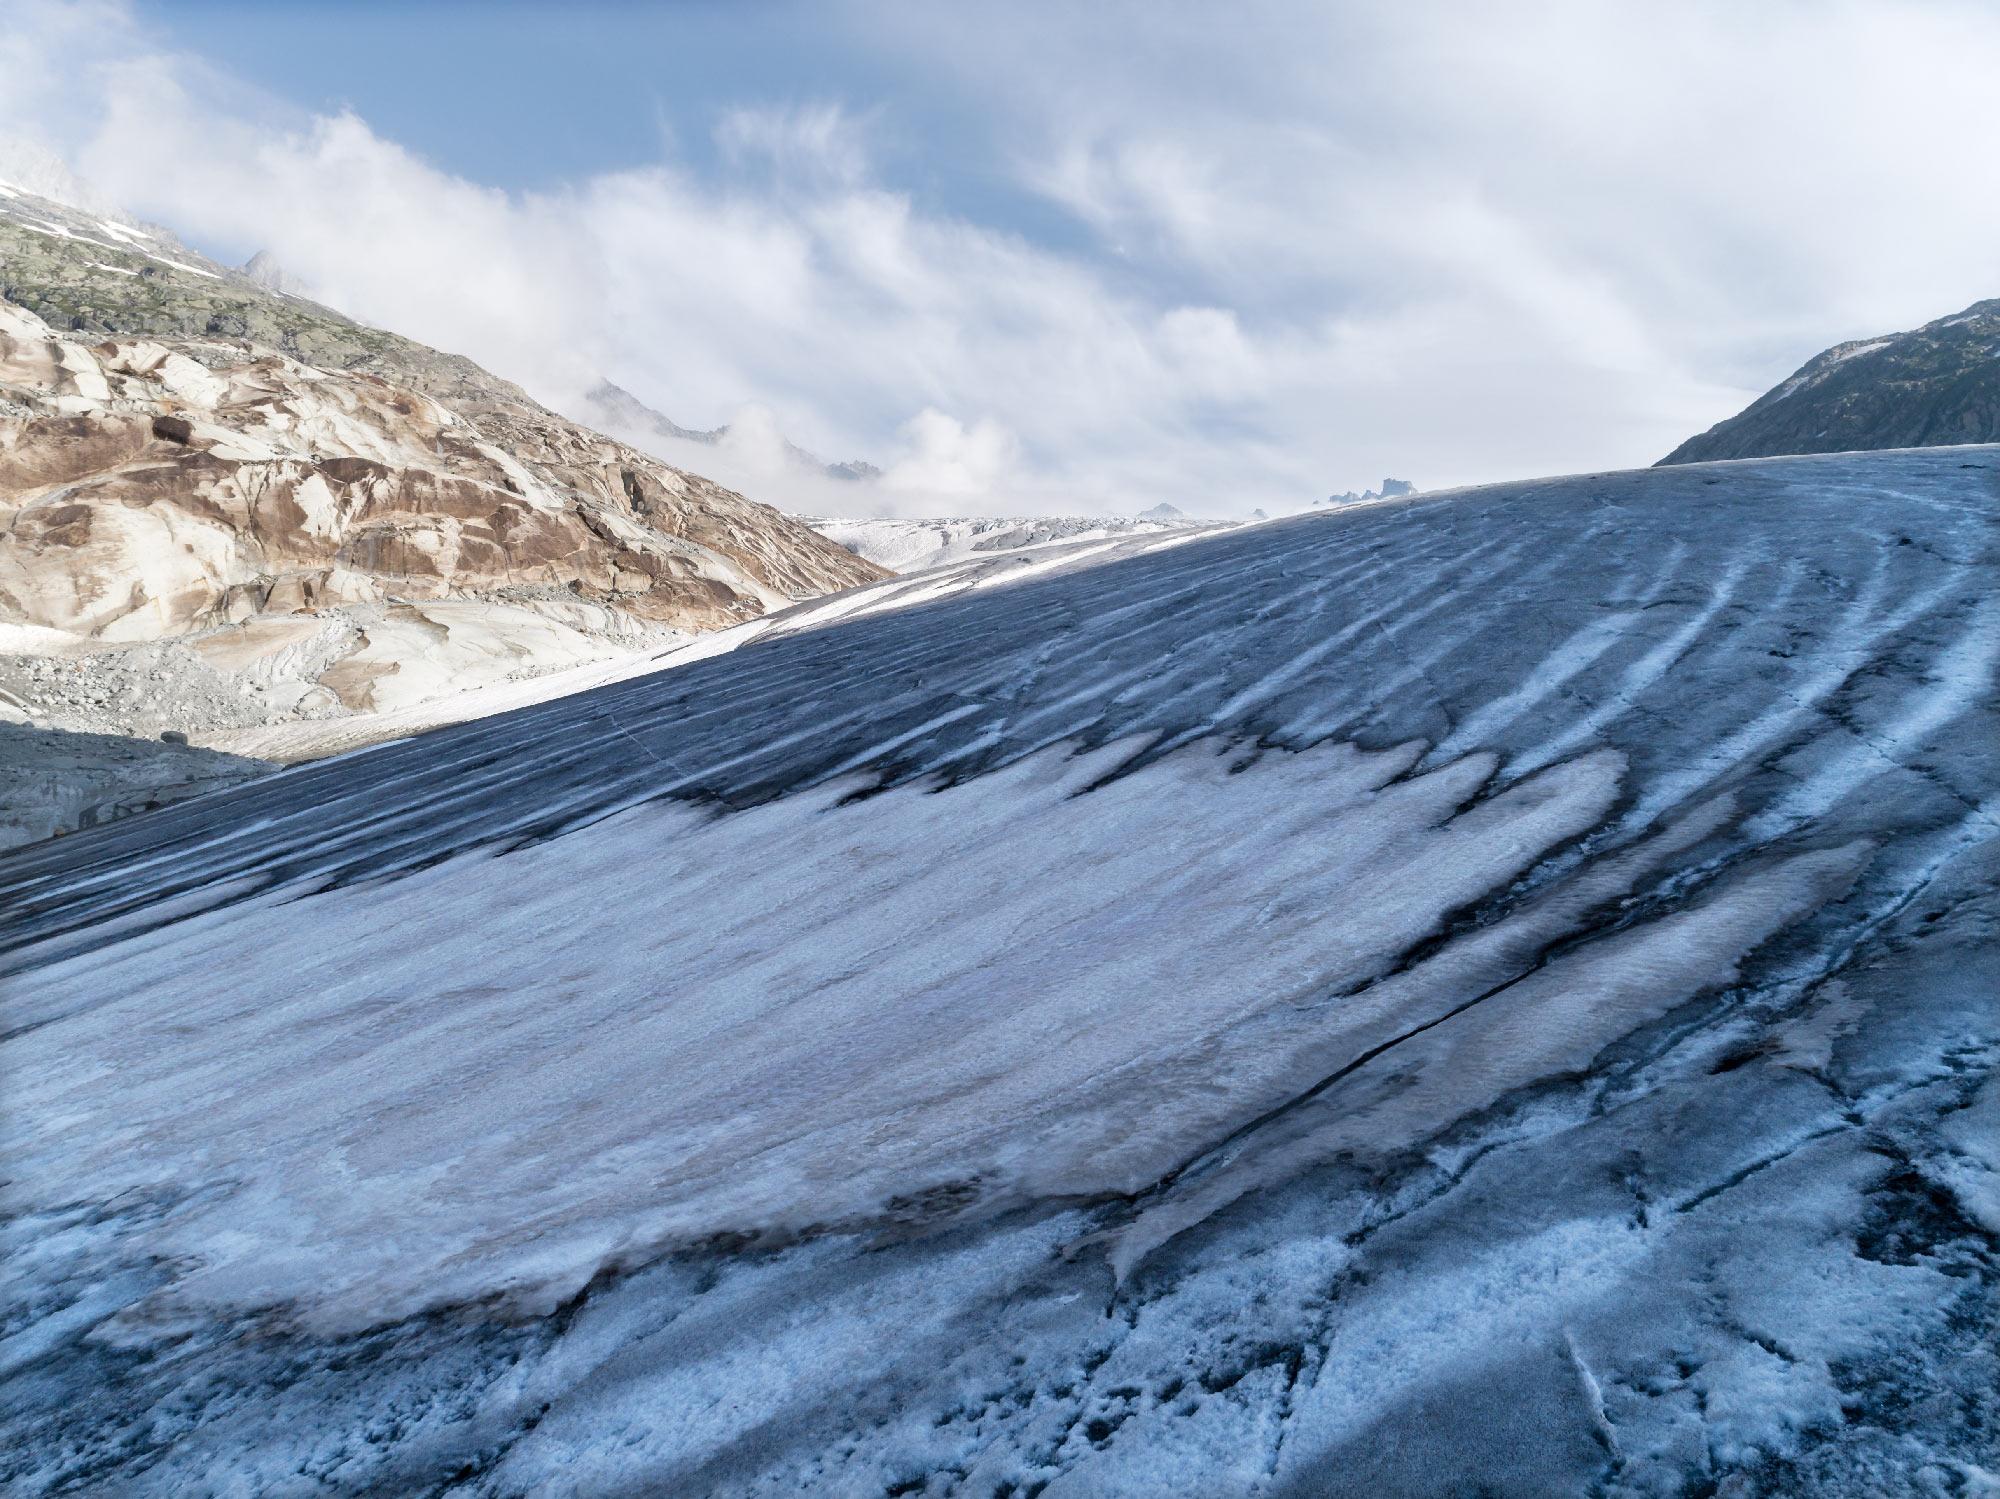 #374 Glaciers, Rhonegletscher, 2018, 46°35'N 8°23'8″E